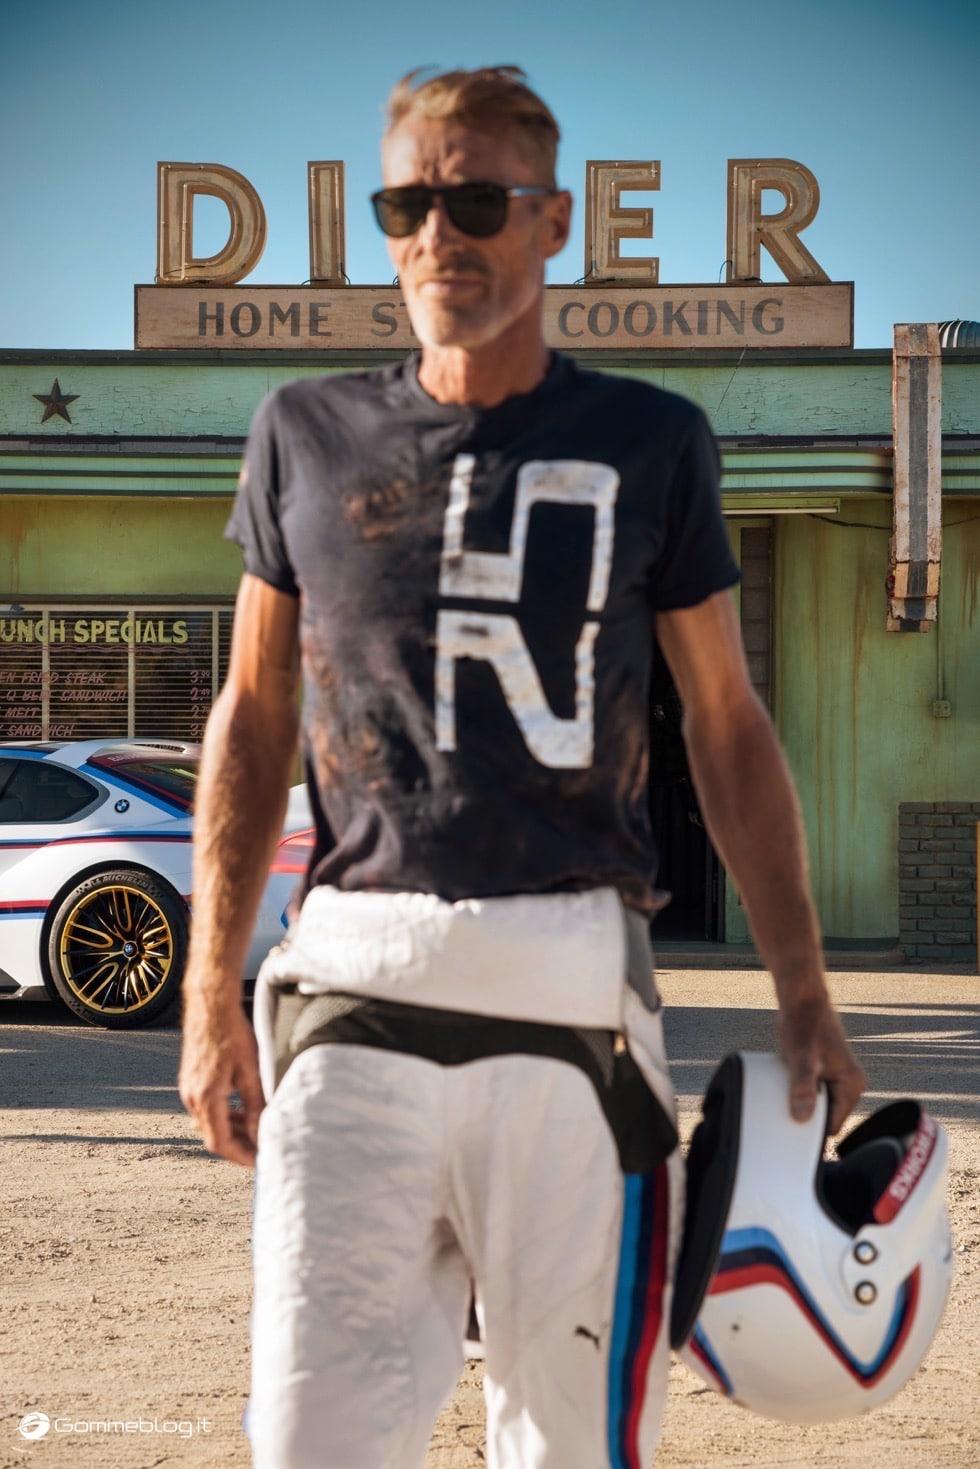 BMW 3.0 CSL Hommage R - Concorso d'Eleganza di Pebble Beach 2015 42